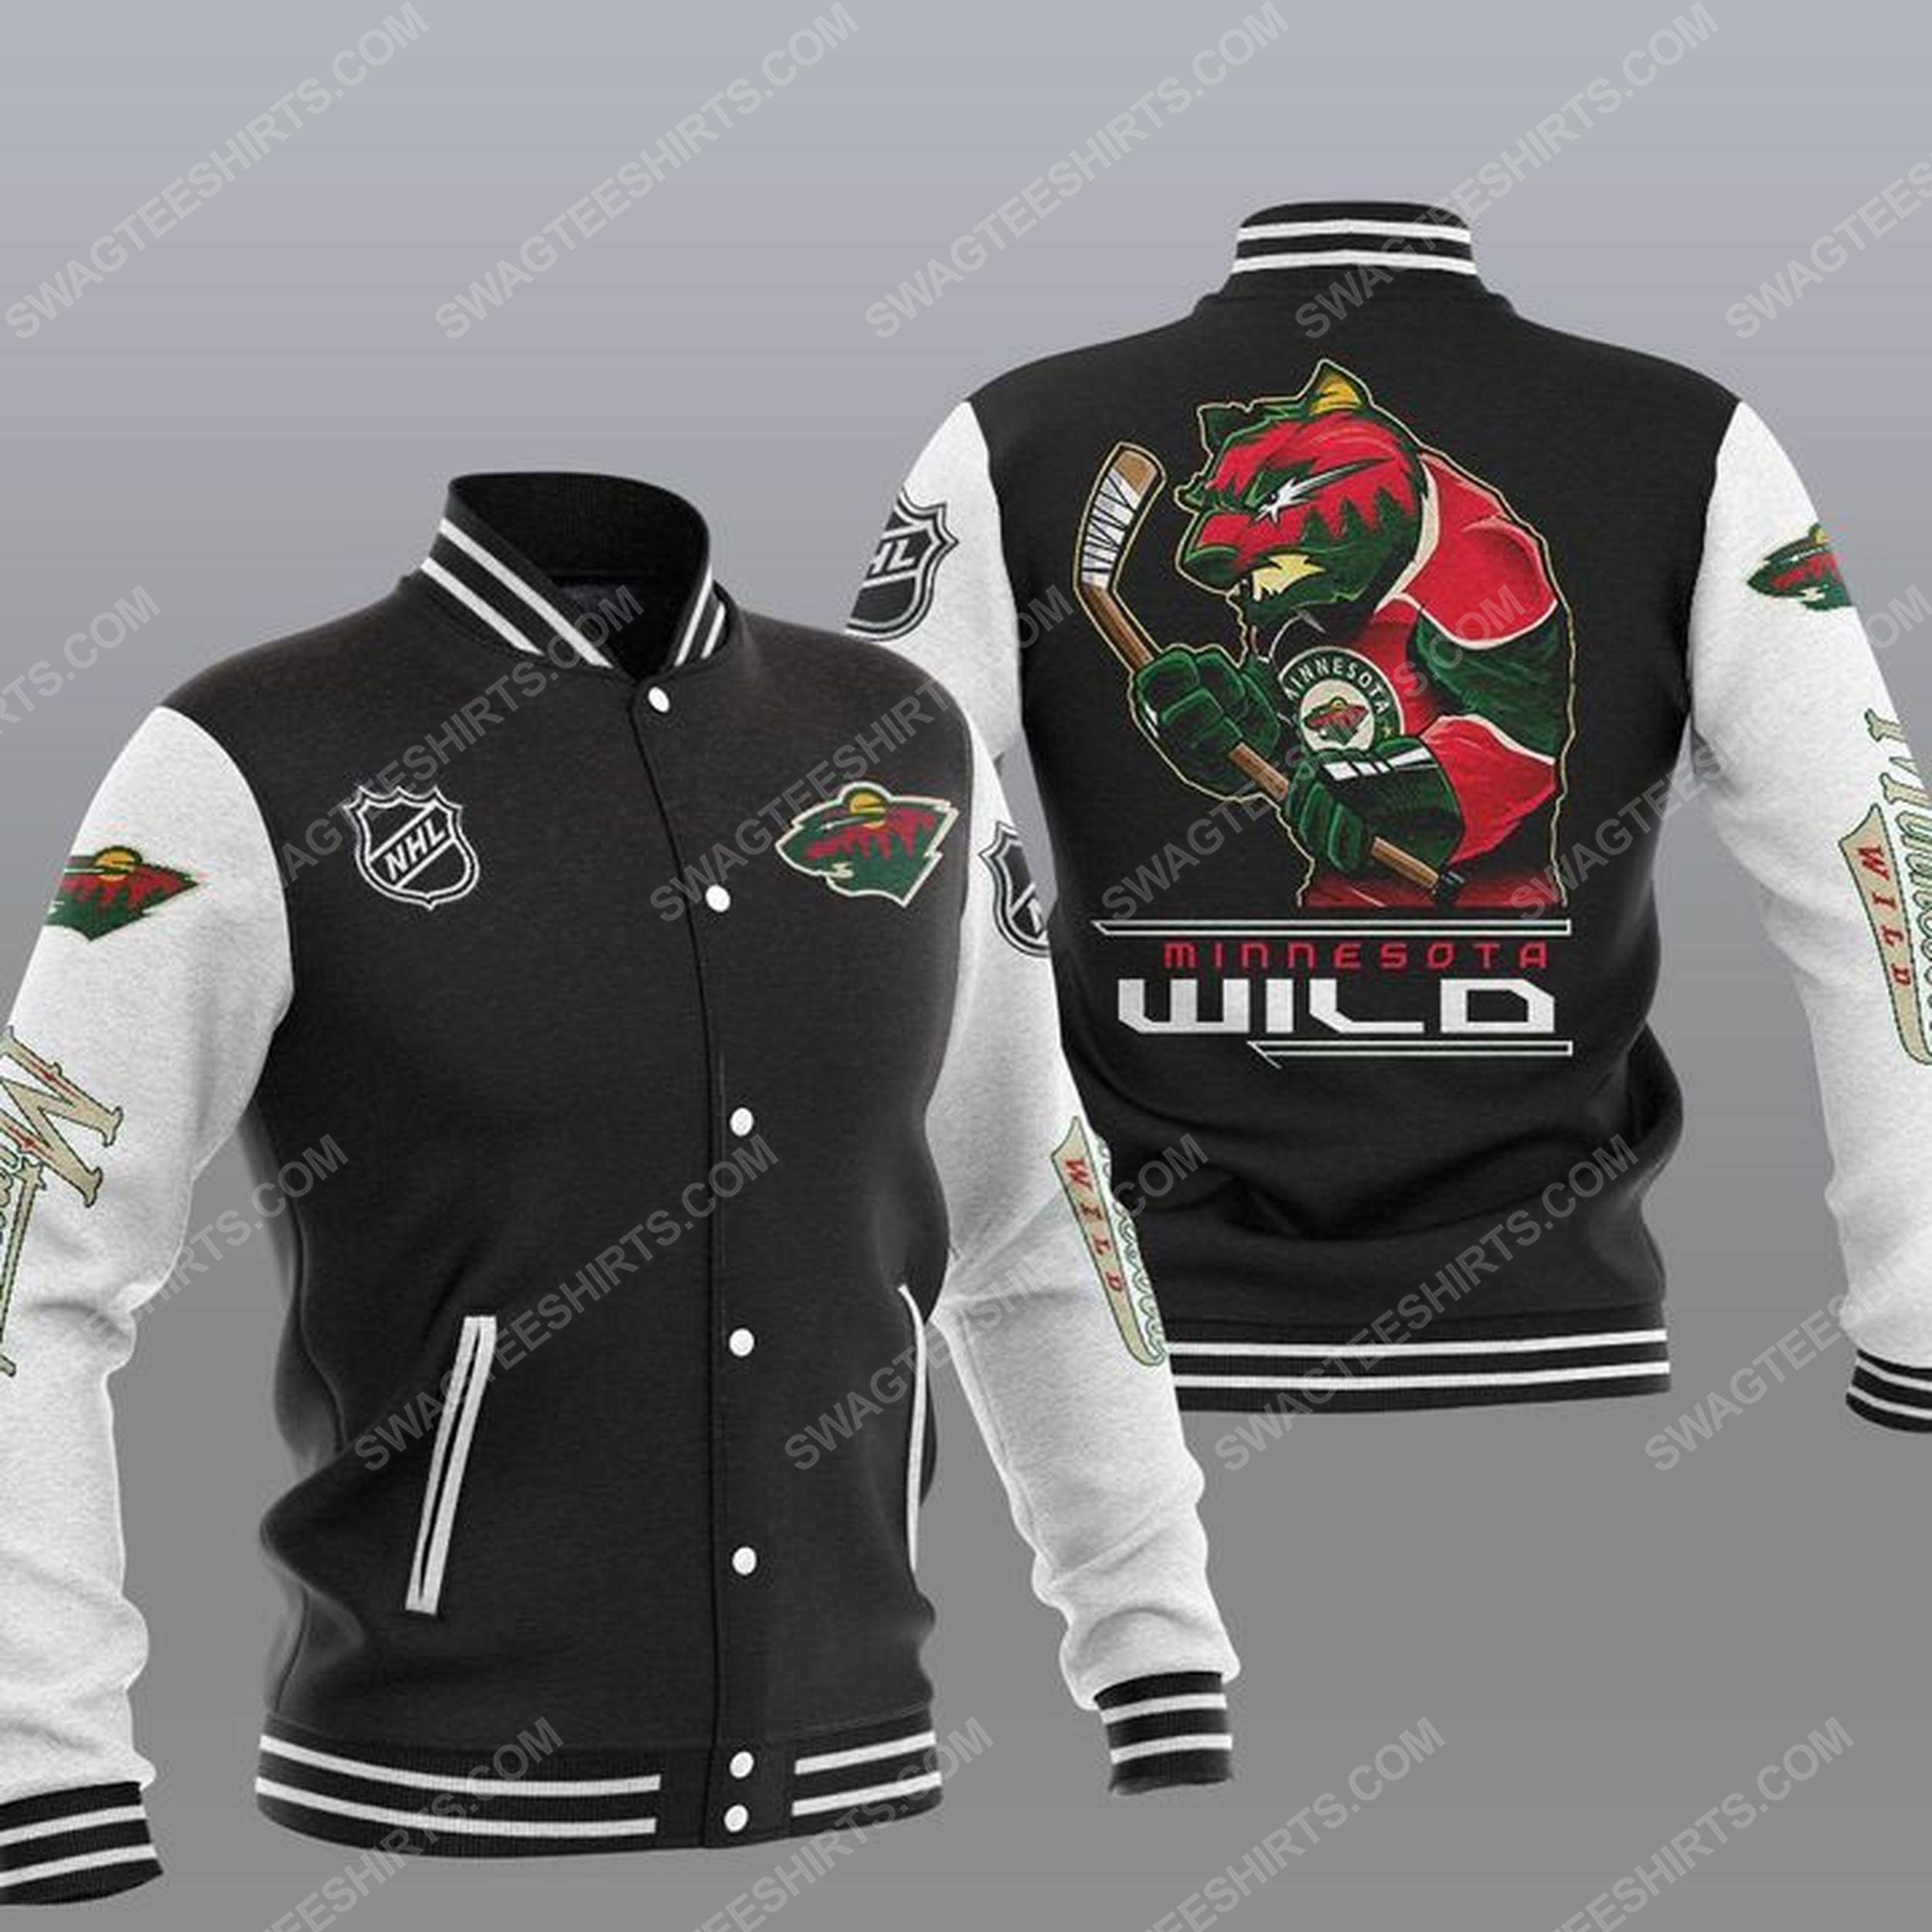 Minnesota wild national hockey league all over print baseball jacket - black 1